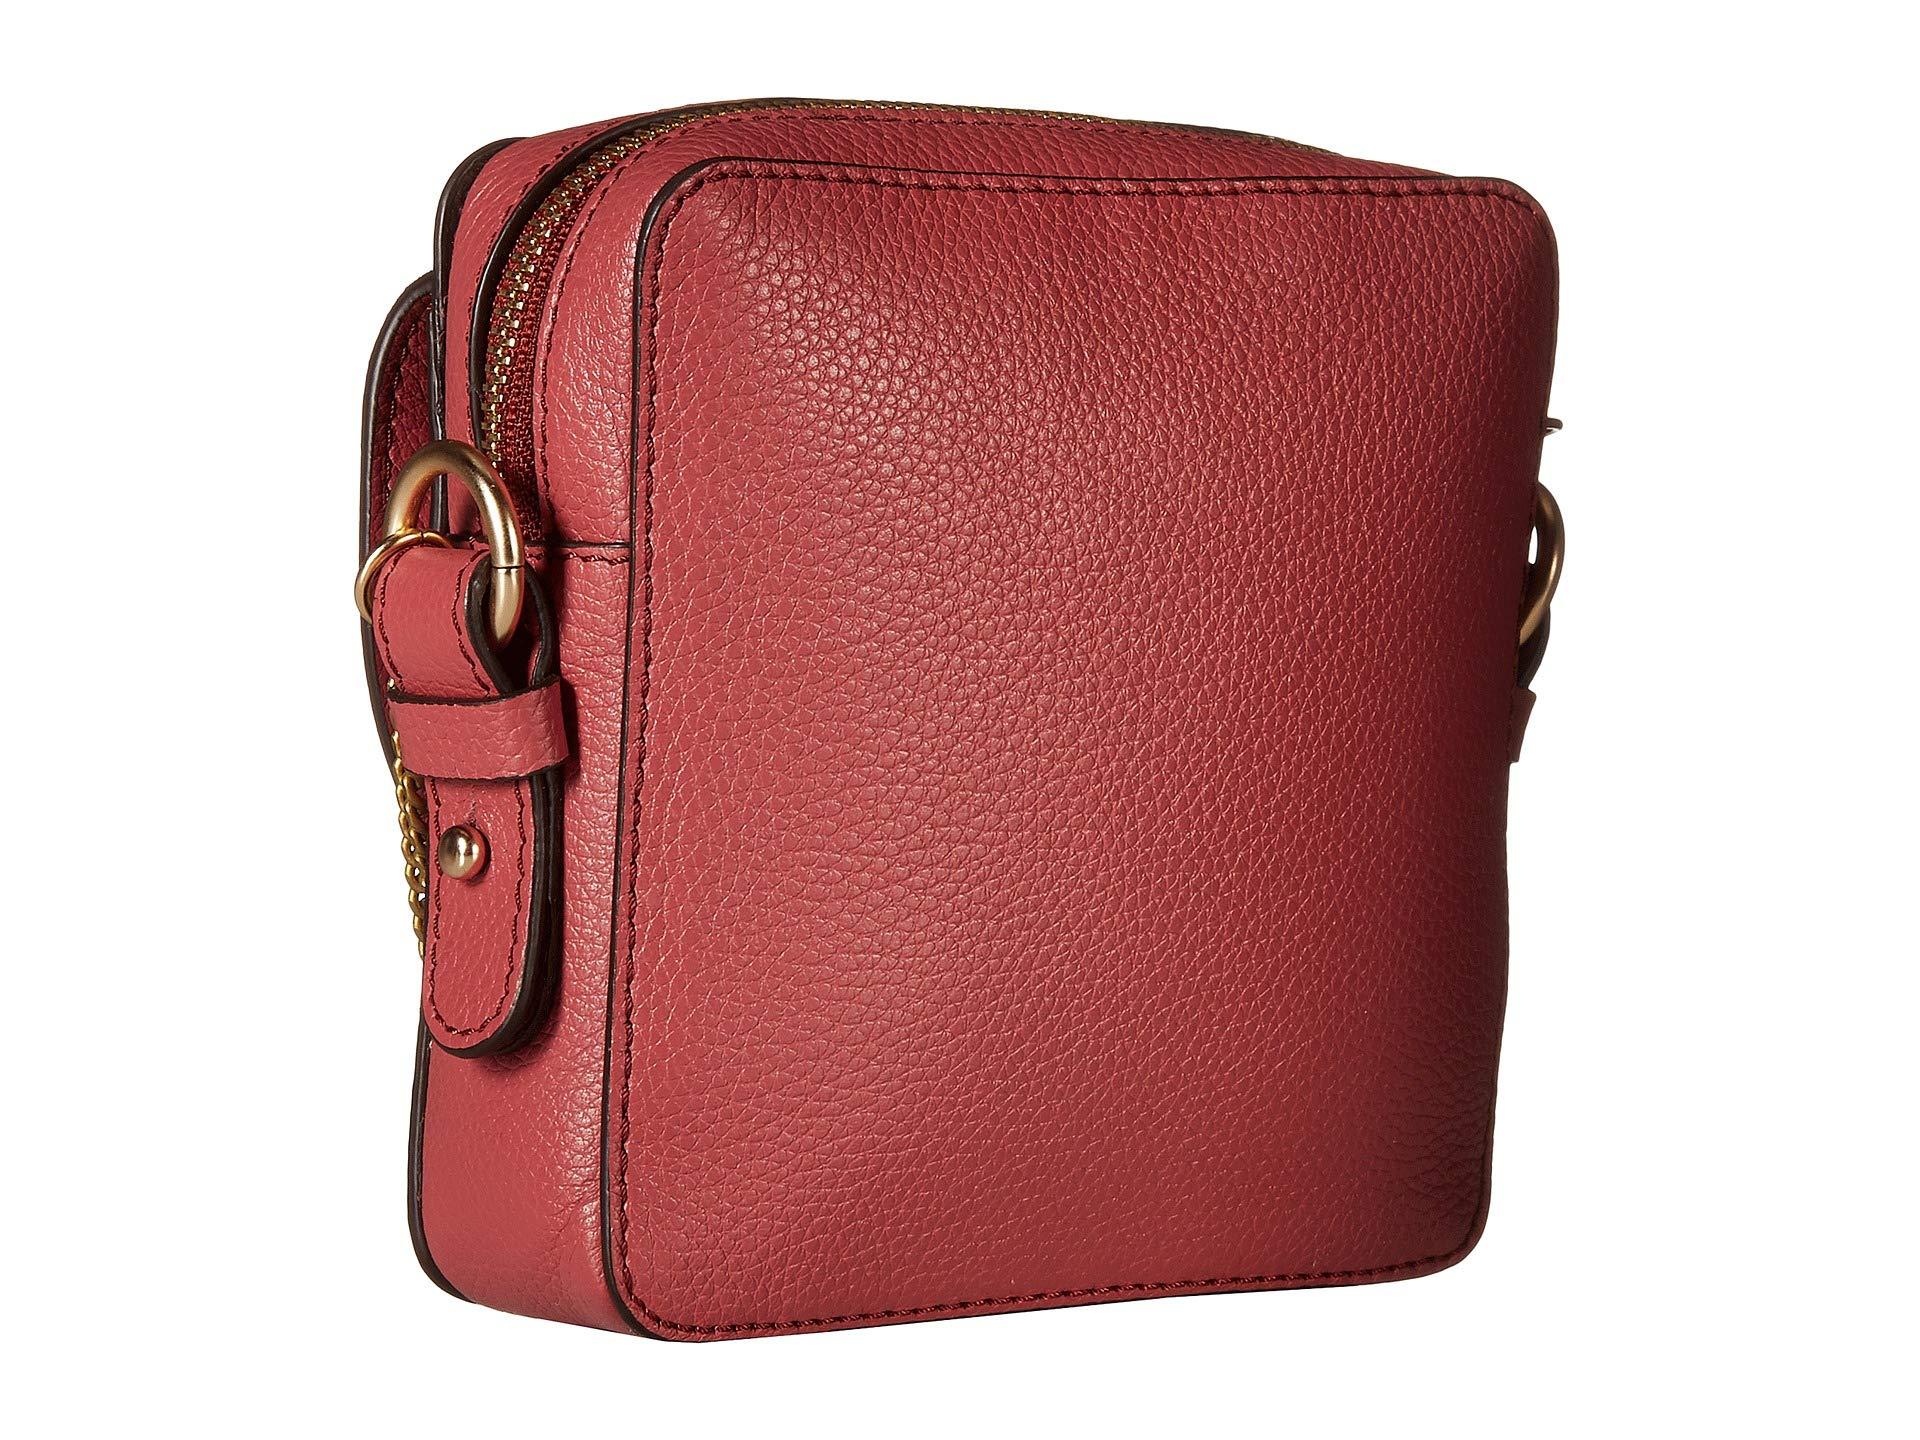 Chloe By See Bag Mini Pink Rusty Camera Joan wH55qFg